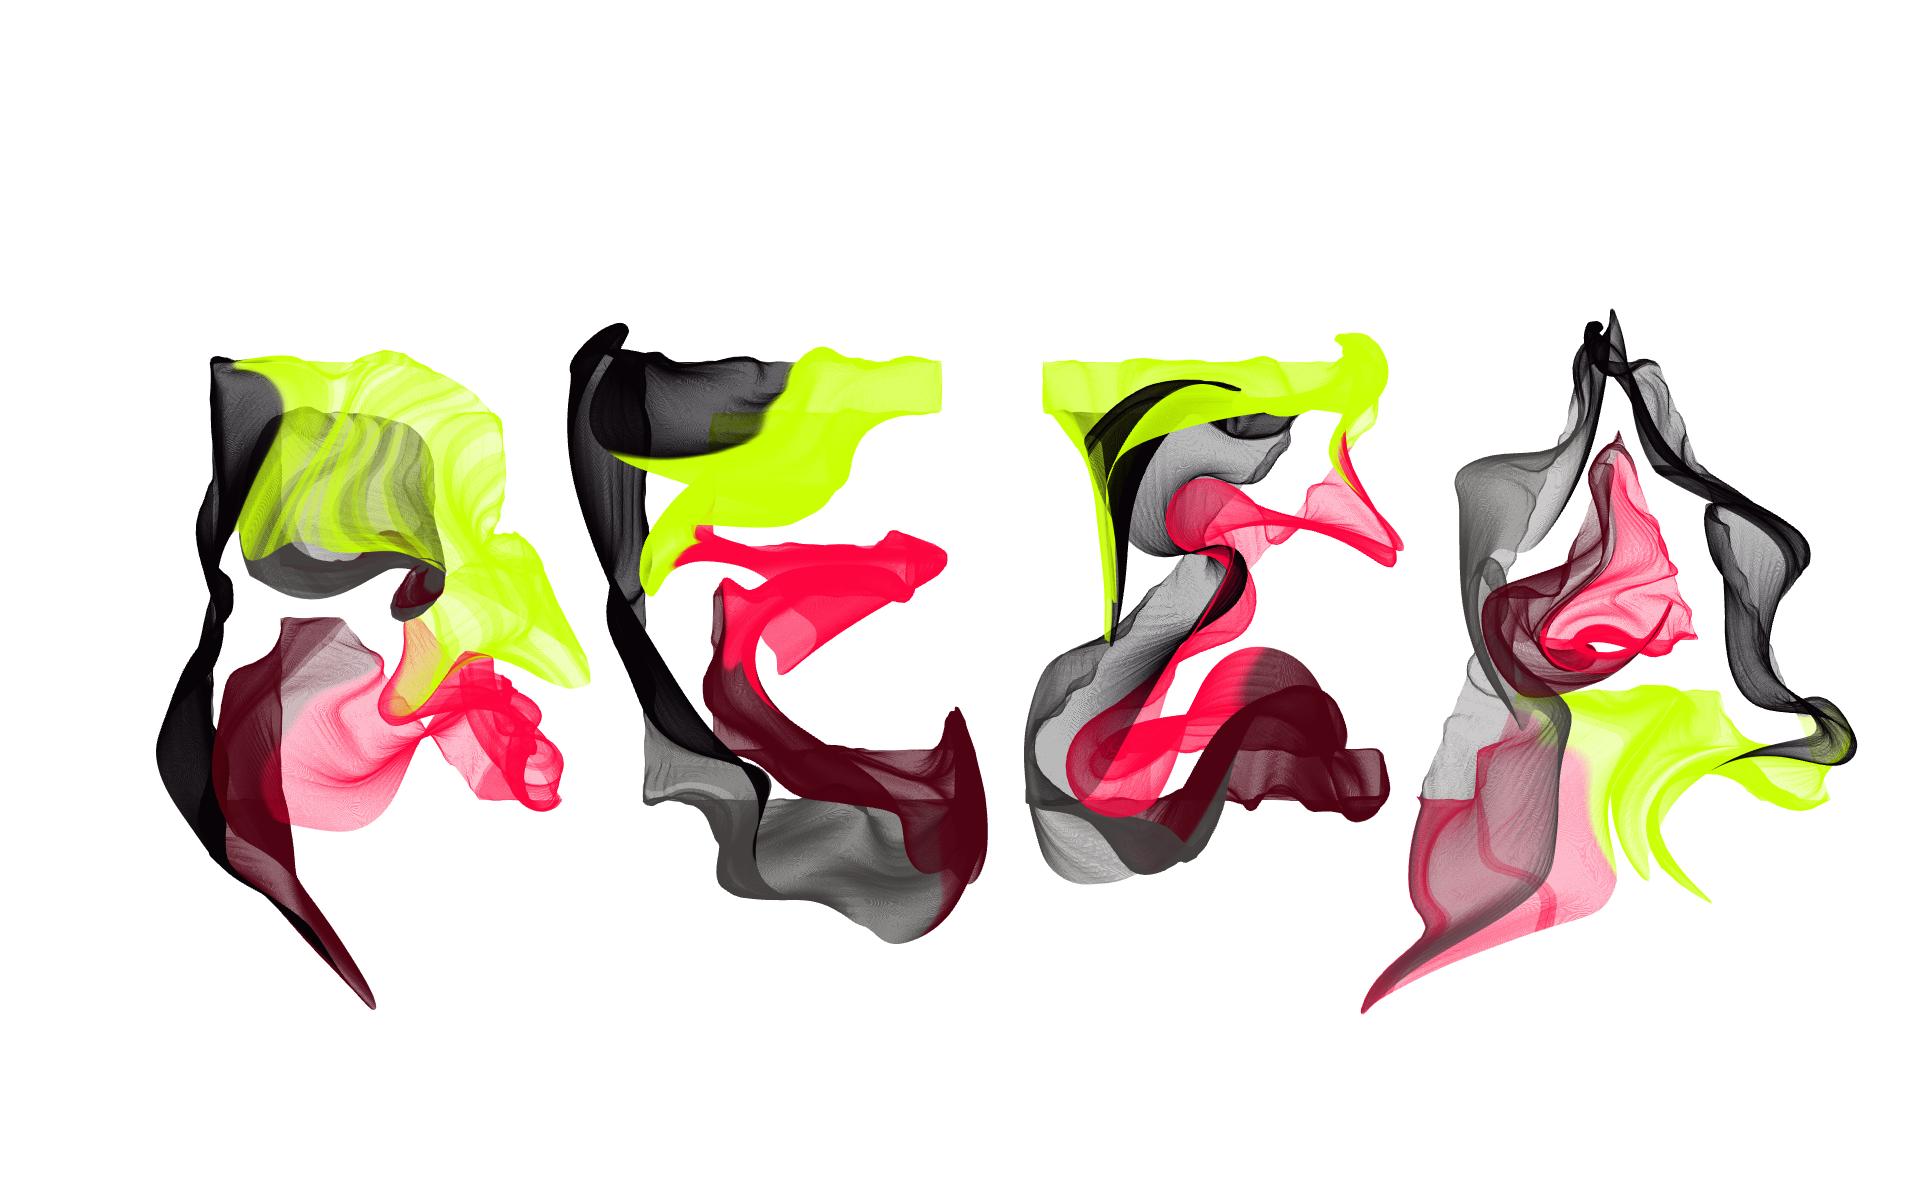 TypoSprings-10-10-2010-1-54-14.png